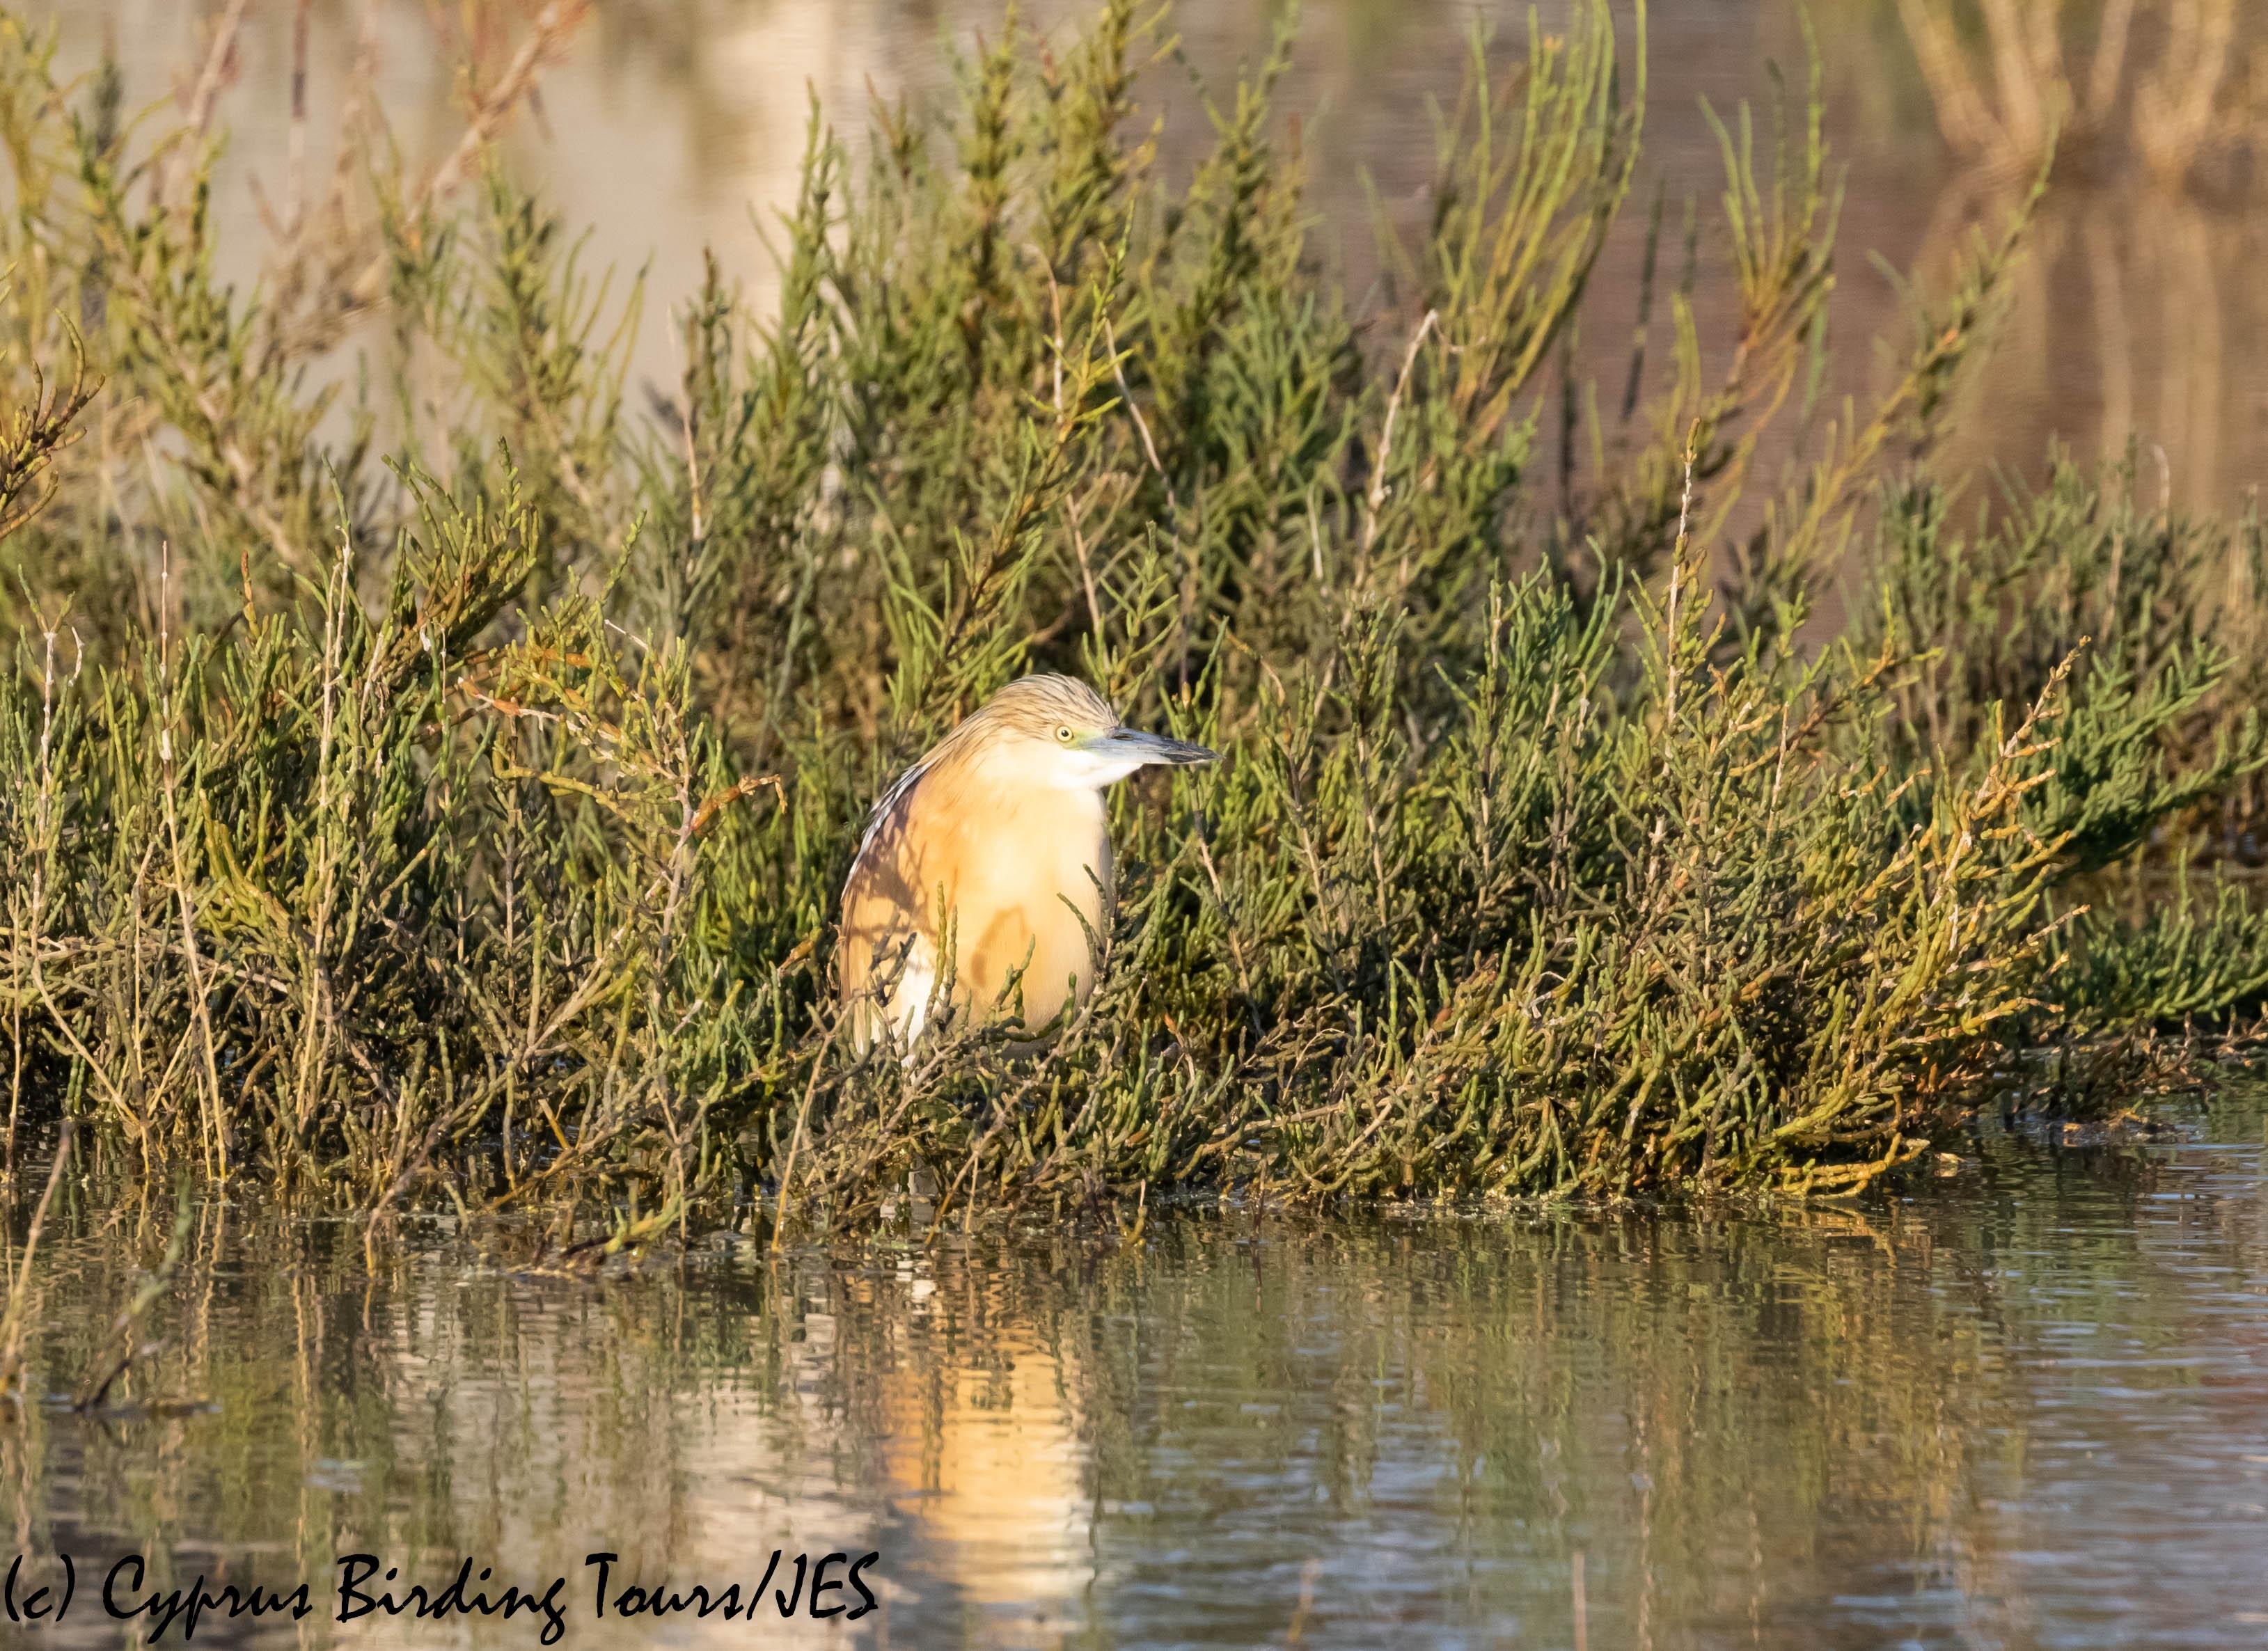 Squacco Heron, Larnaca, 19th April 2019 (c) Cyprus Birding Tours